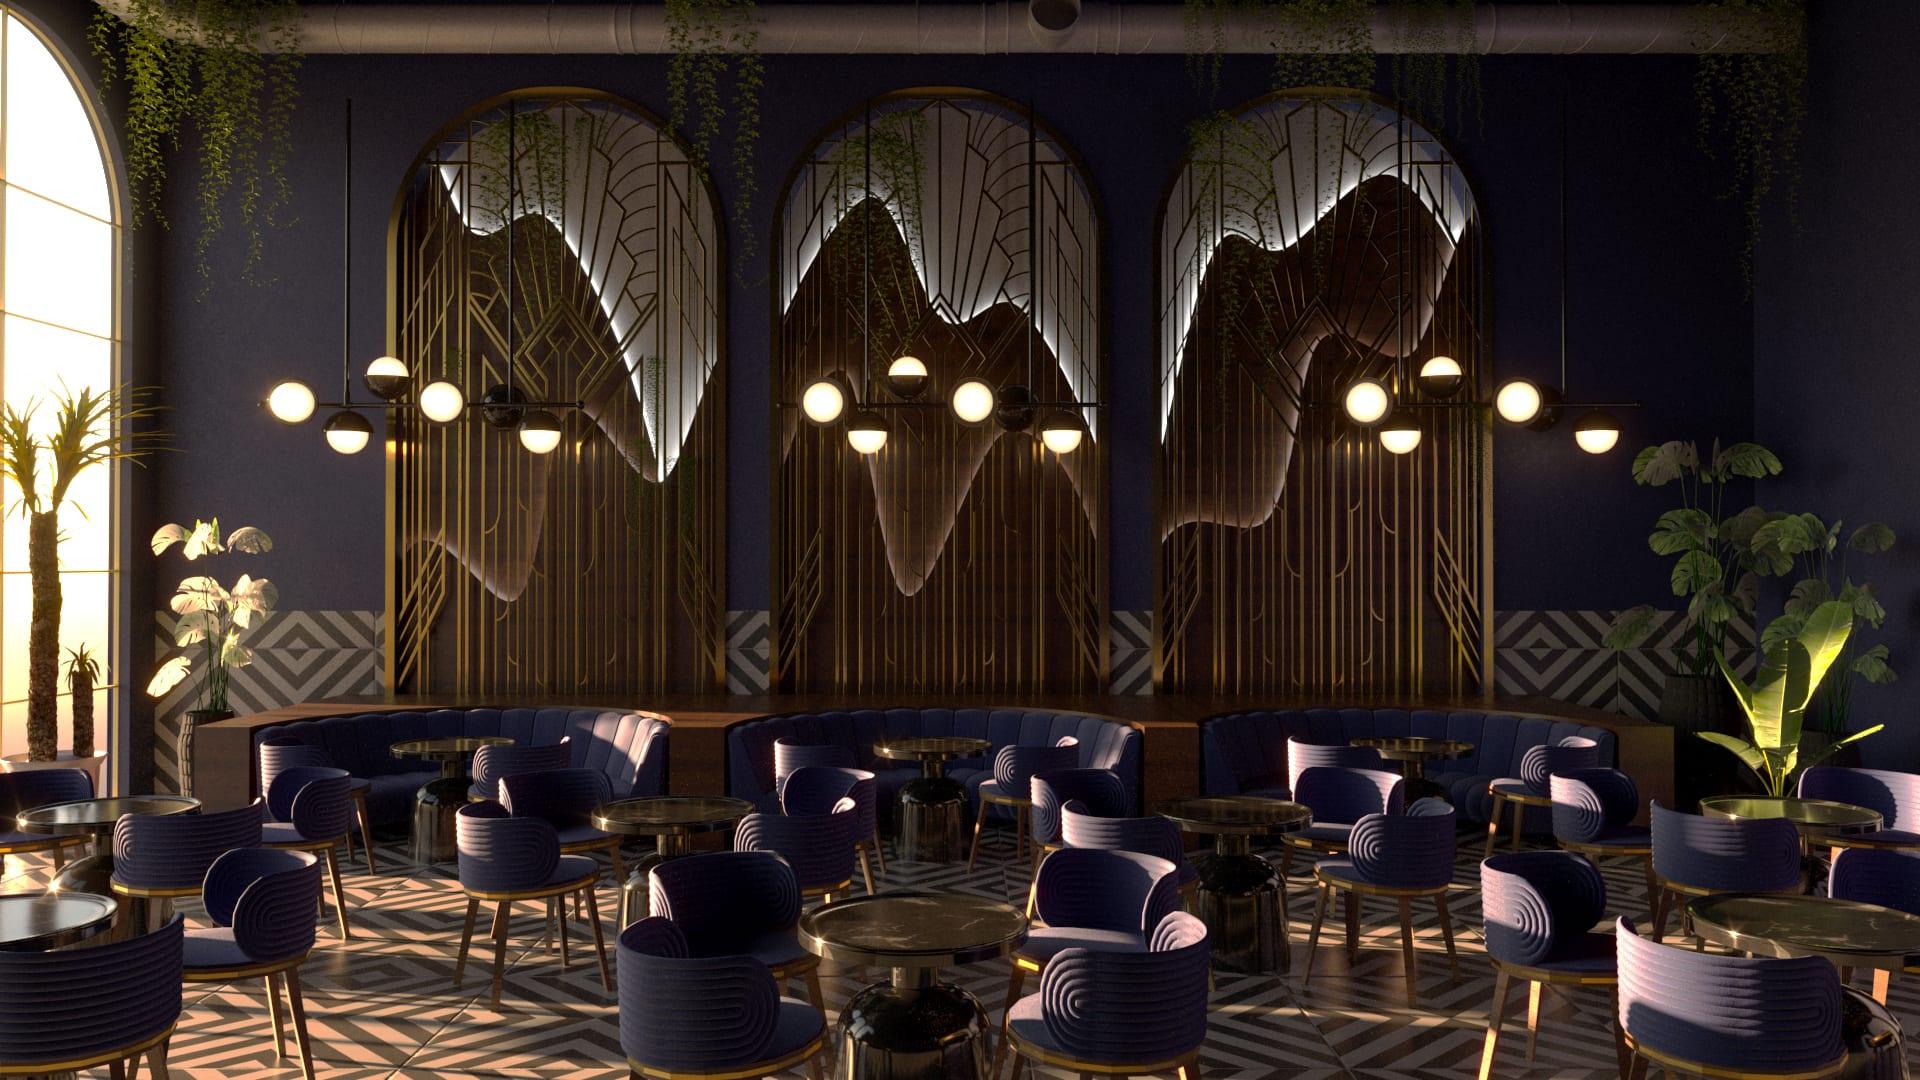 ba-production-arts-for-screen-Hannah-Seddon-bar-interior.jpg